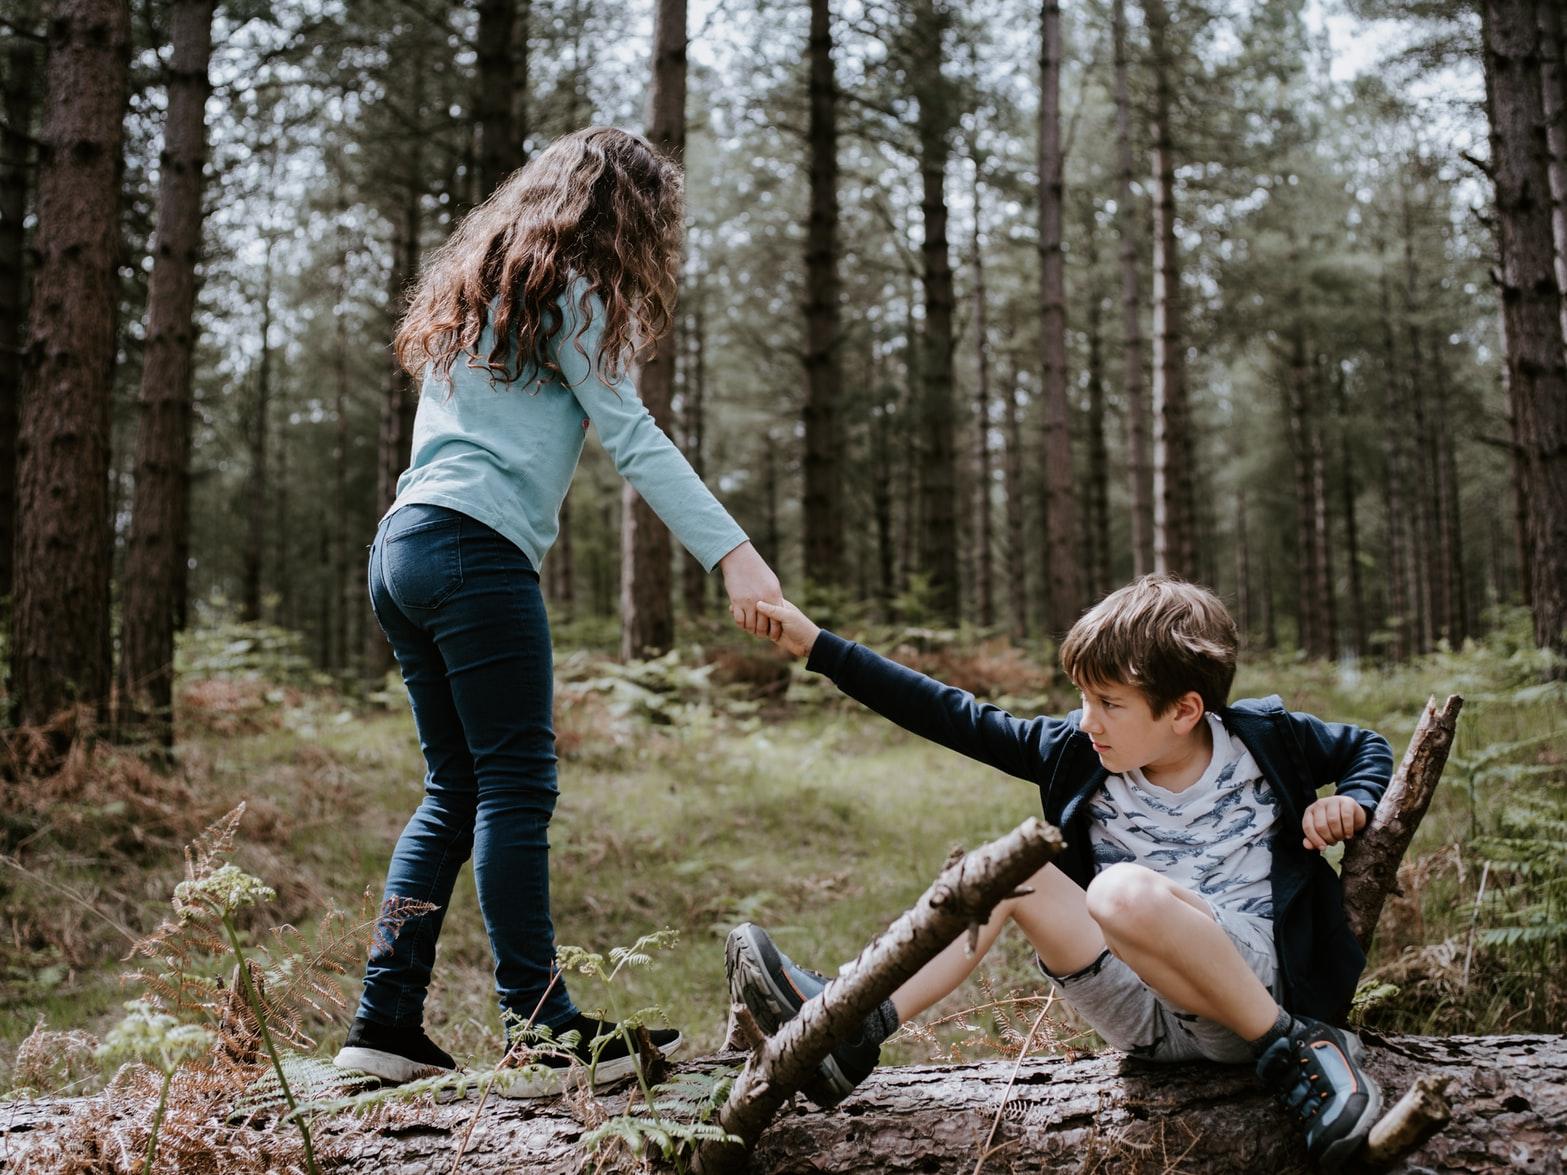 Brunette girl helping brunette boy stand up in forest